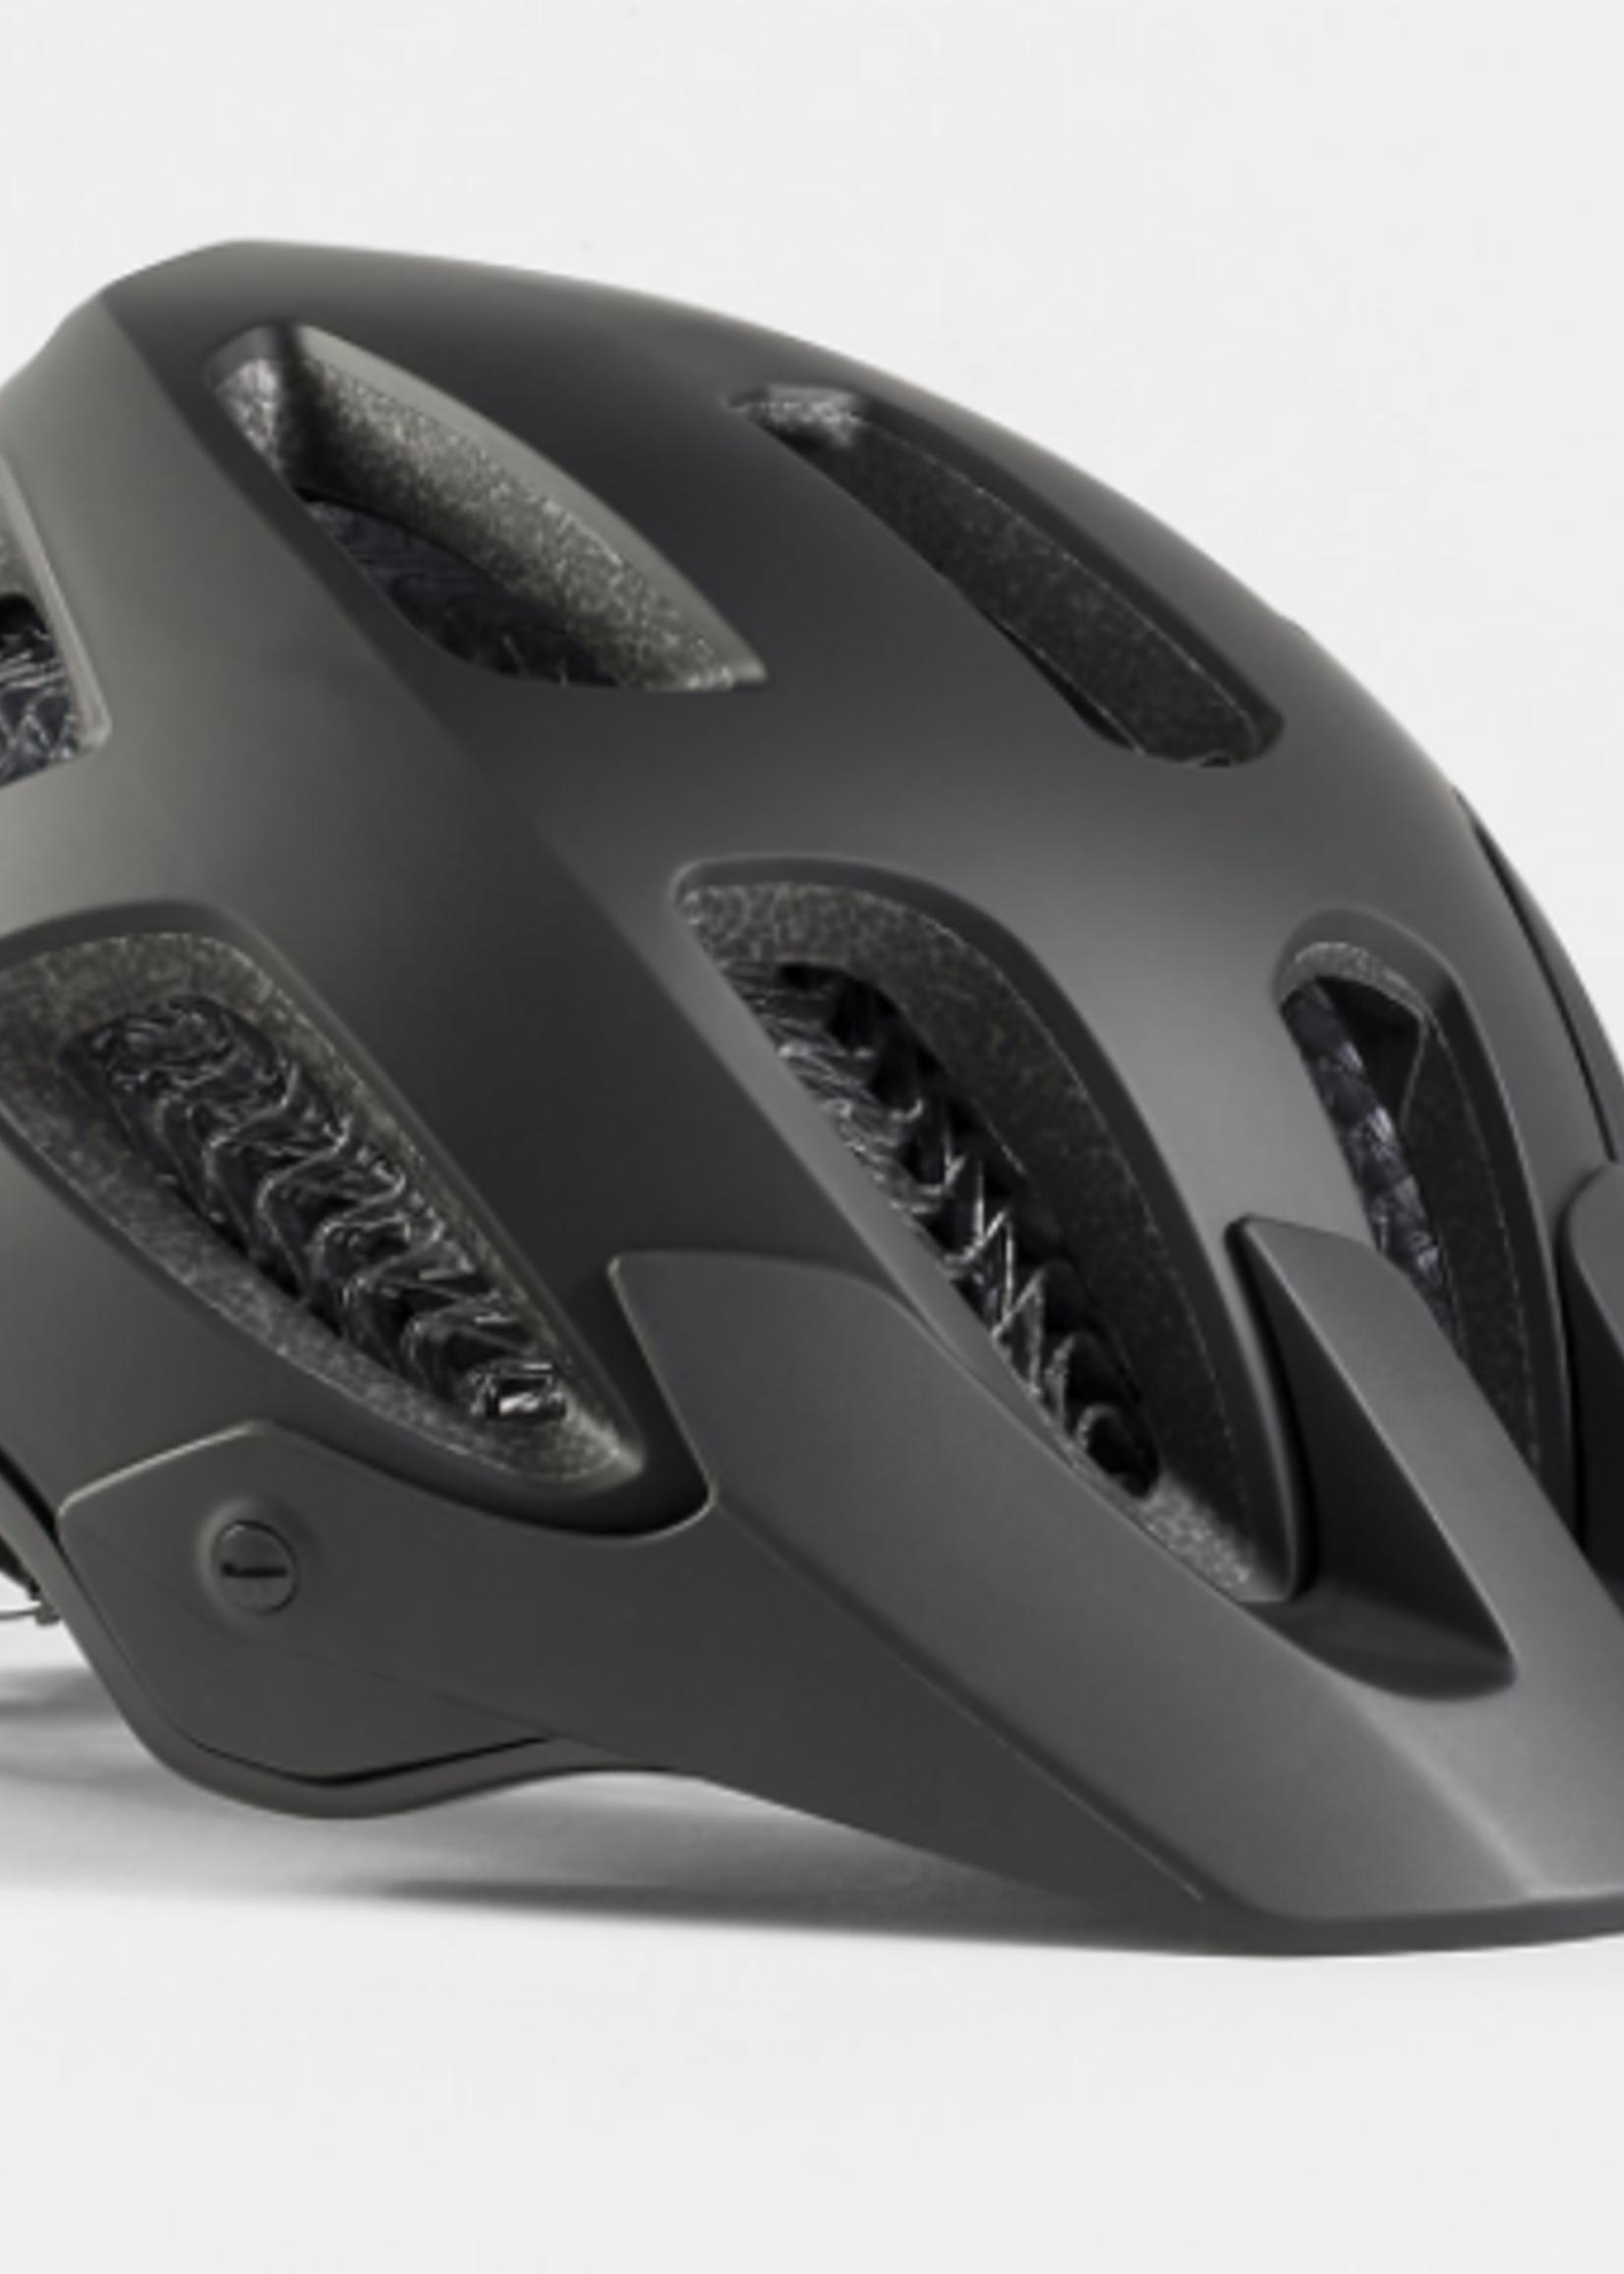 Bontrager Helmet Bontrager Rally WaveCel Medium Black CPSC